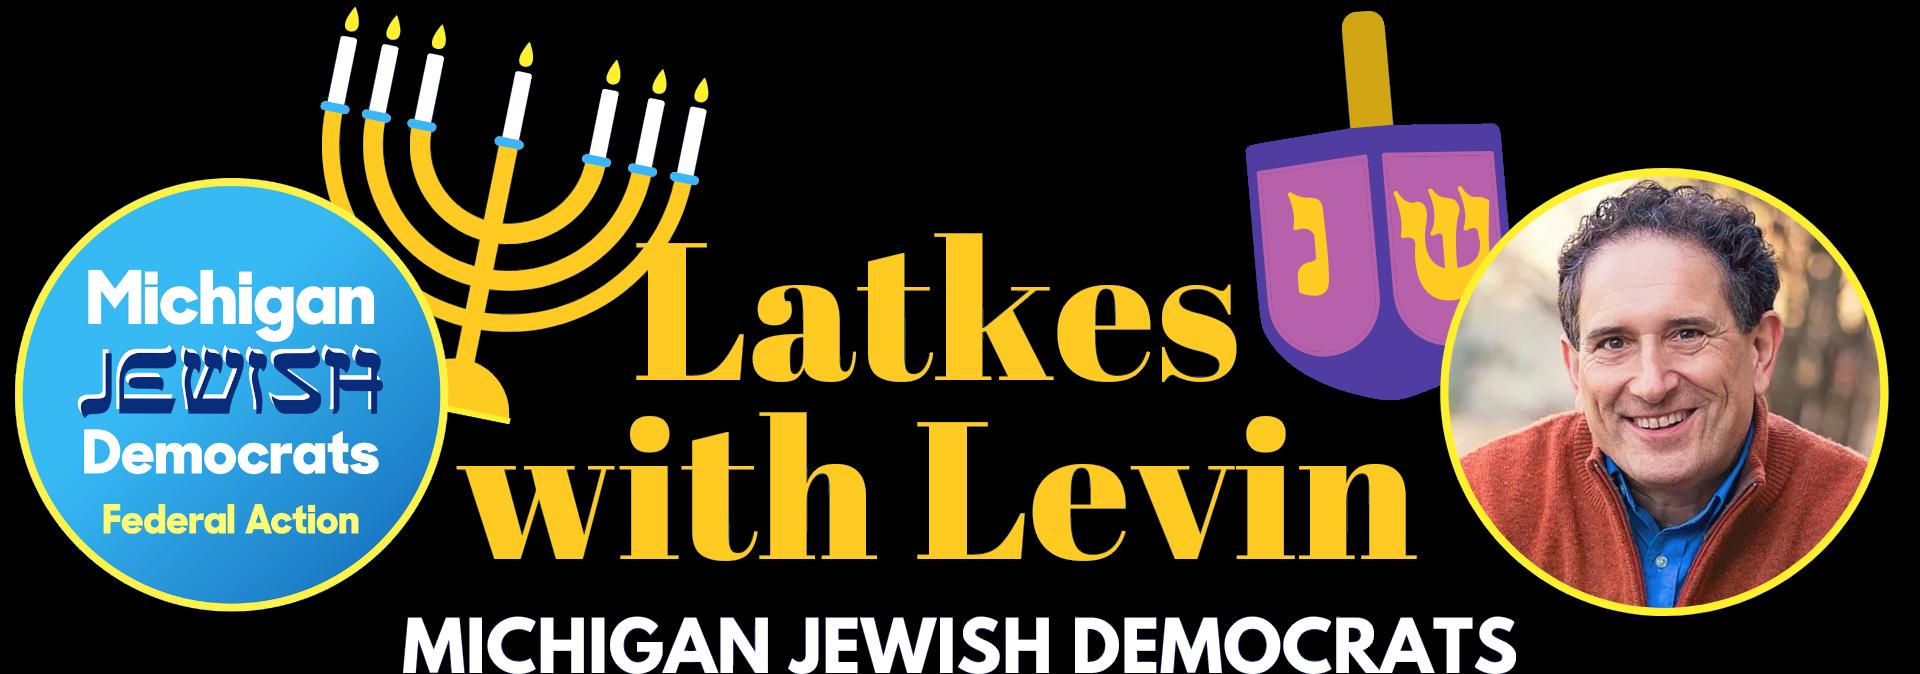 Michigan Jewish Democrats Federal Action